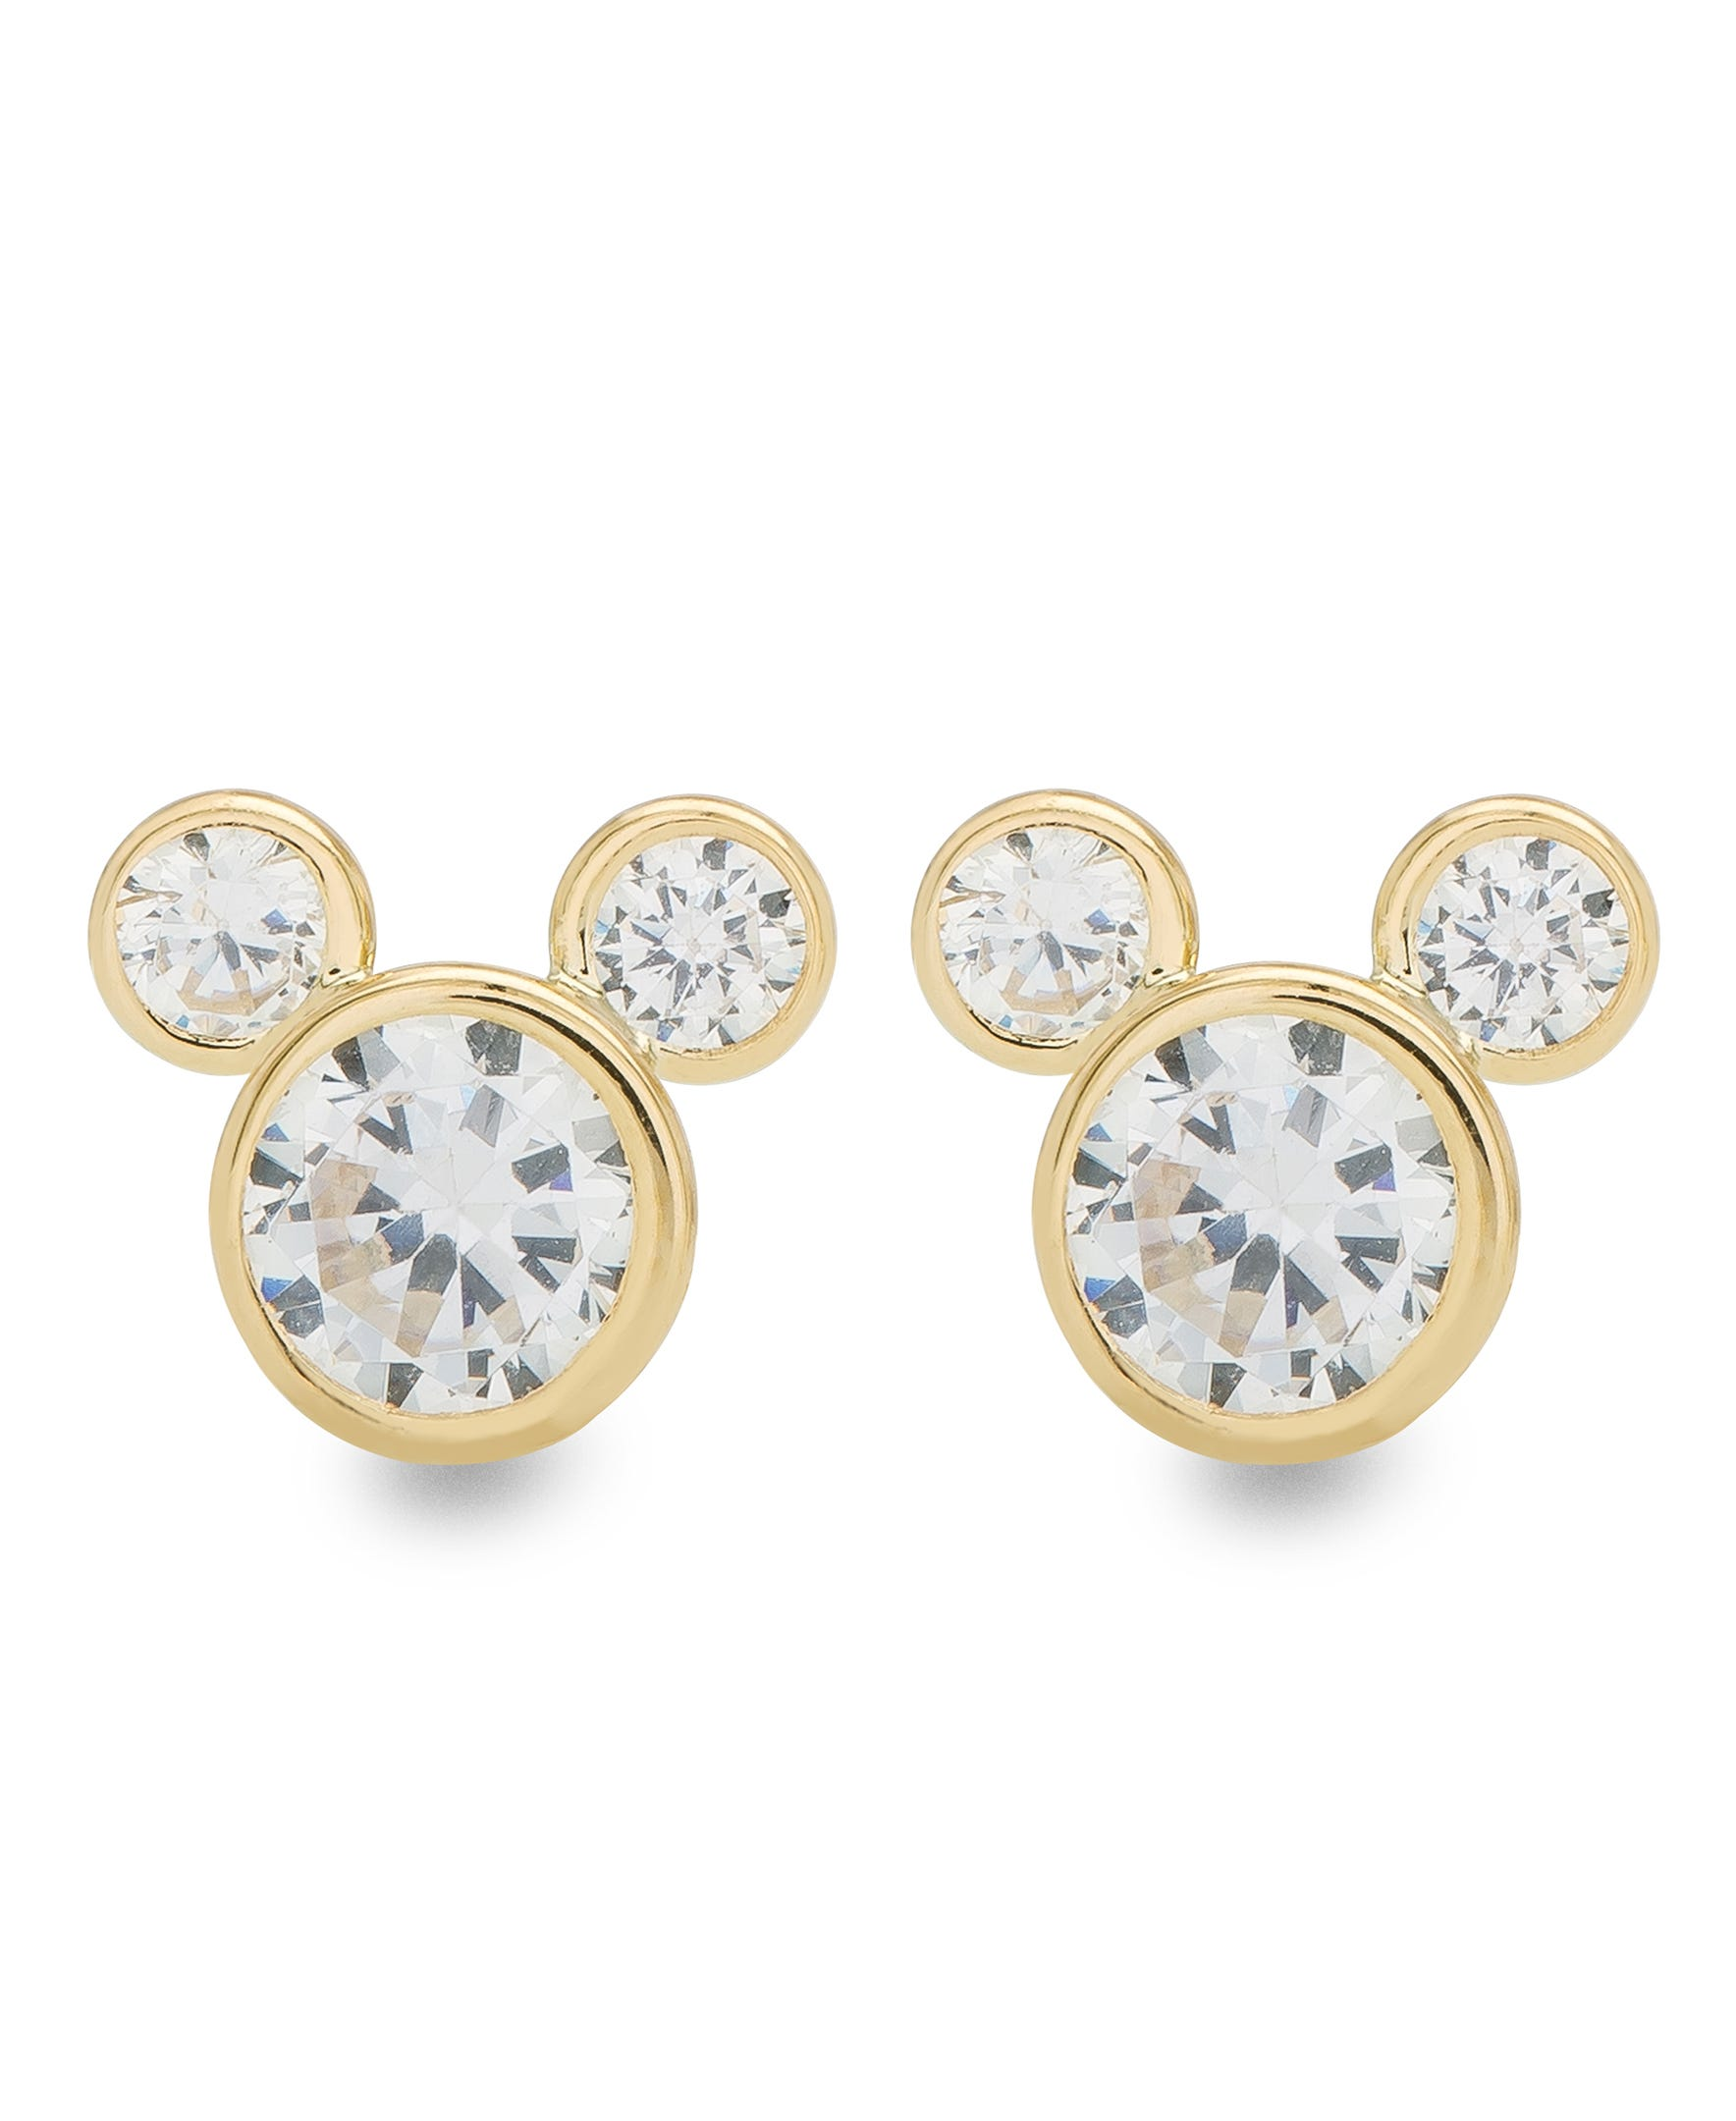 DISNEY© Mickey Mouse CZ Stud Earrings in 10k Yellow Gold